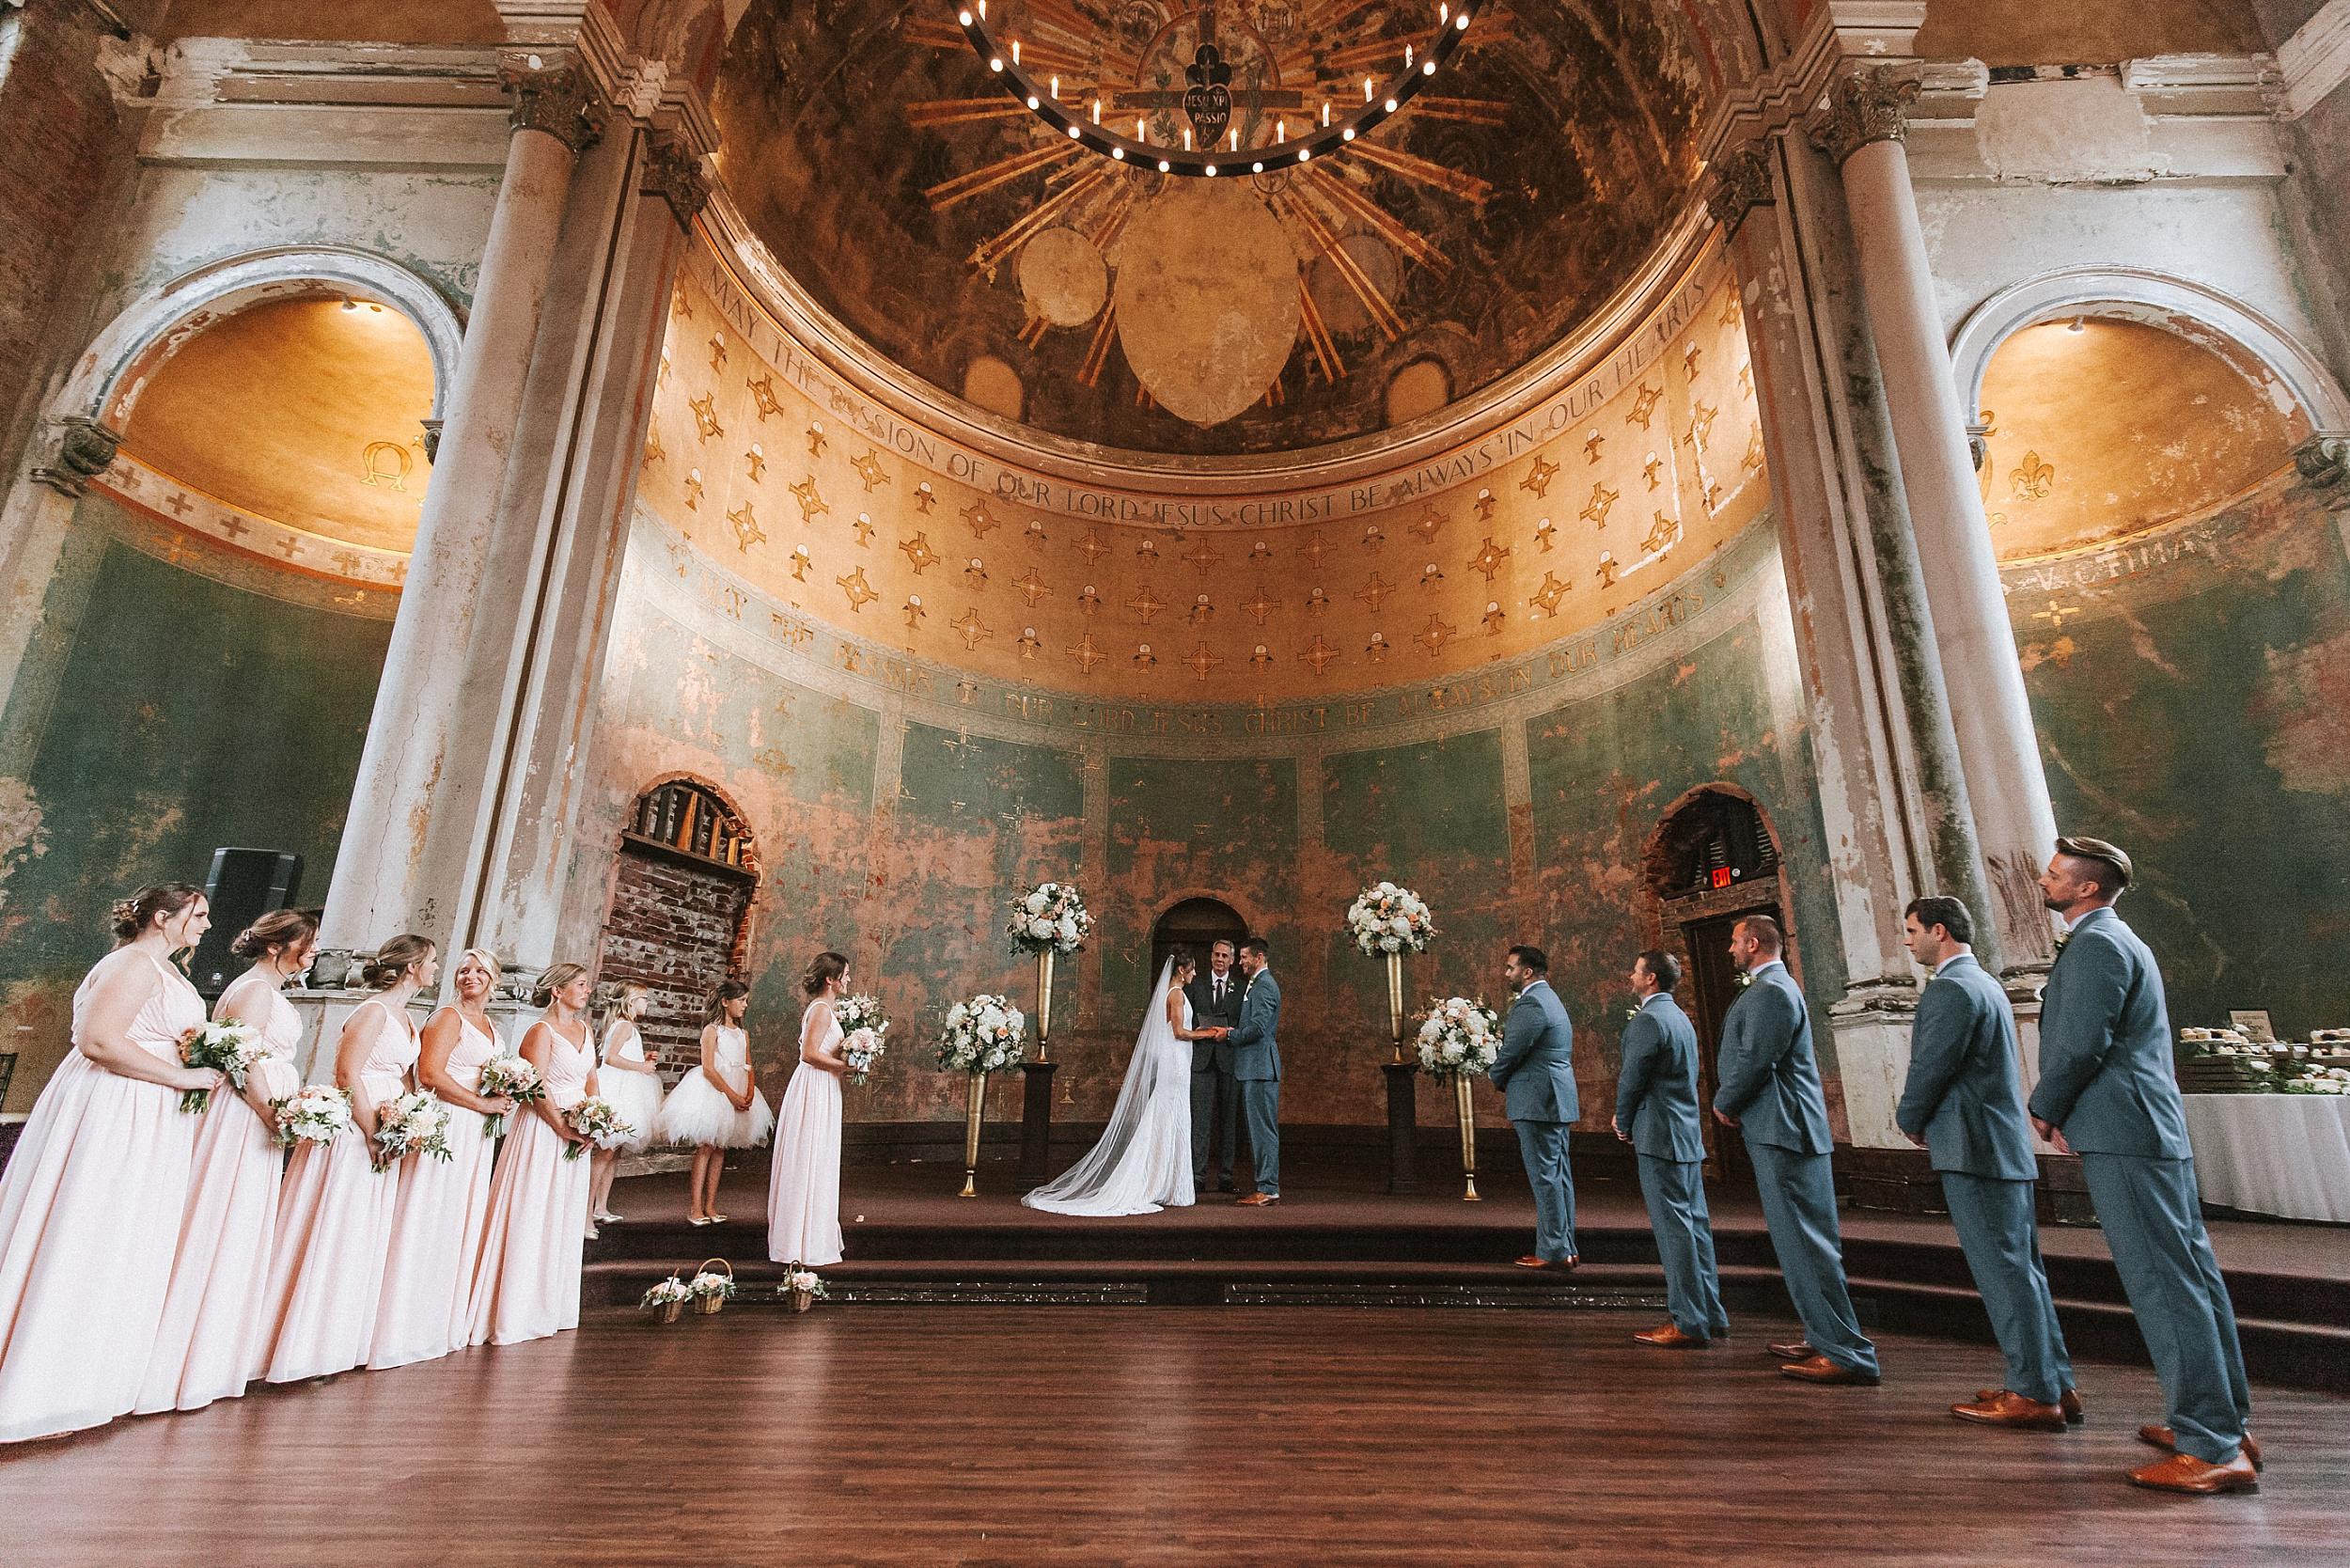 Brooke Townsend Photography - Cincinnati Wedding Photographer (124 of 170).jpg